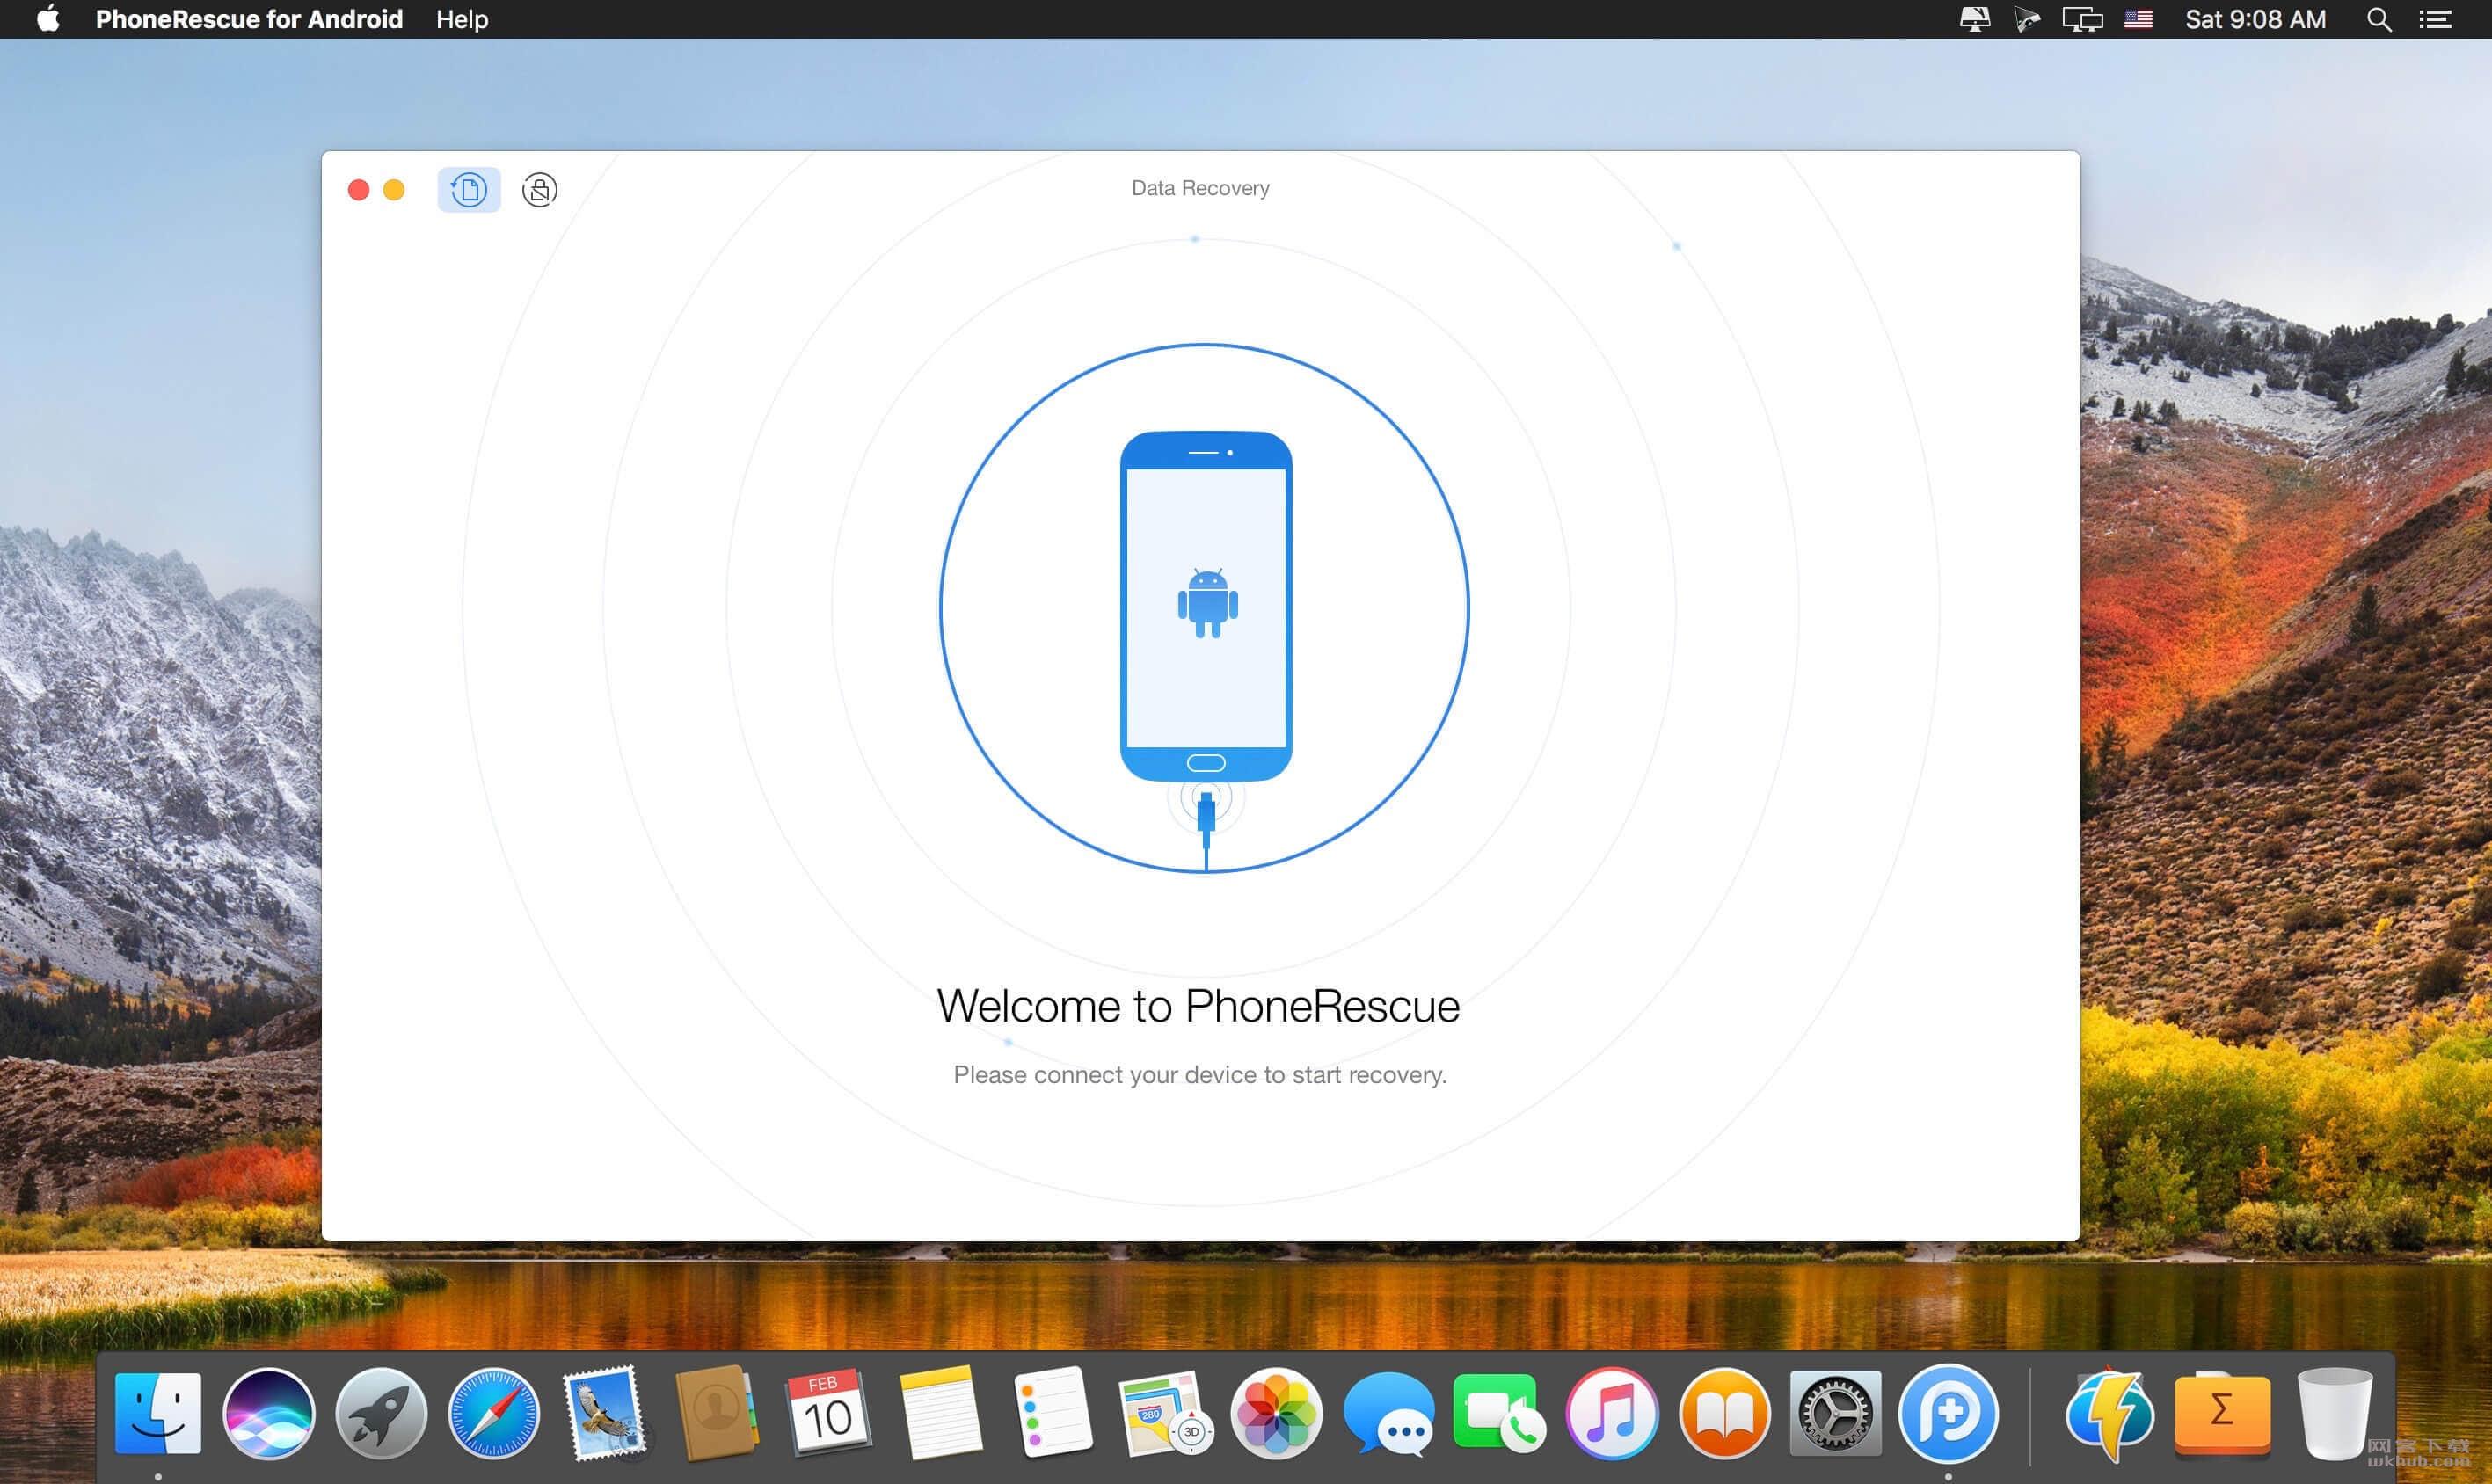 PhoneRescue for Android 3.7.0.20181115 安卓设备数据恢复工具